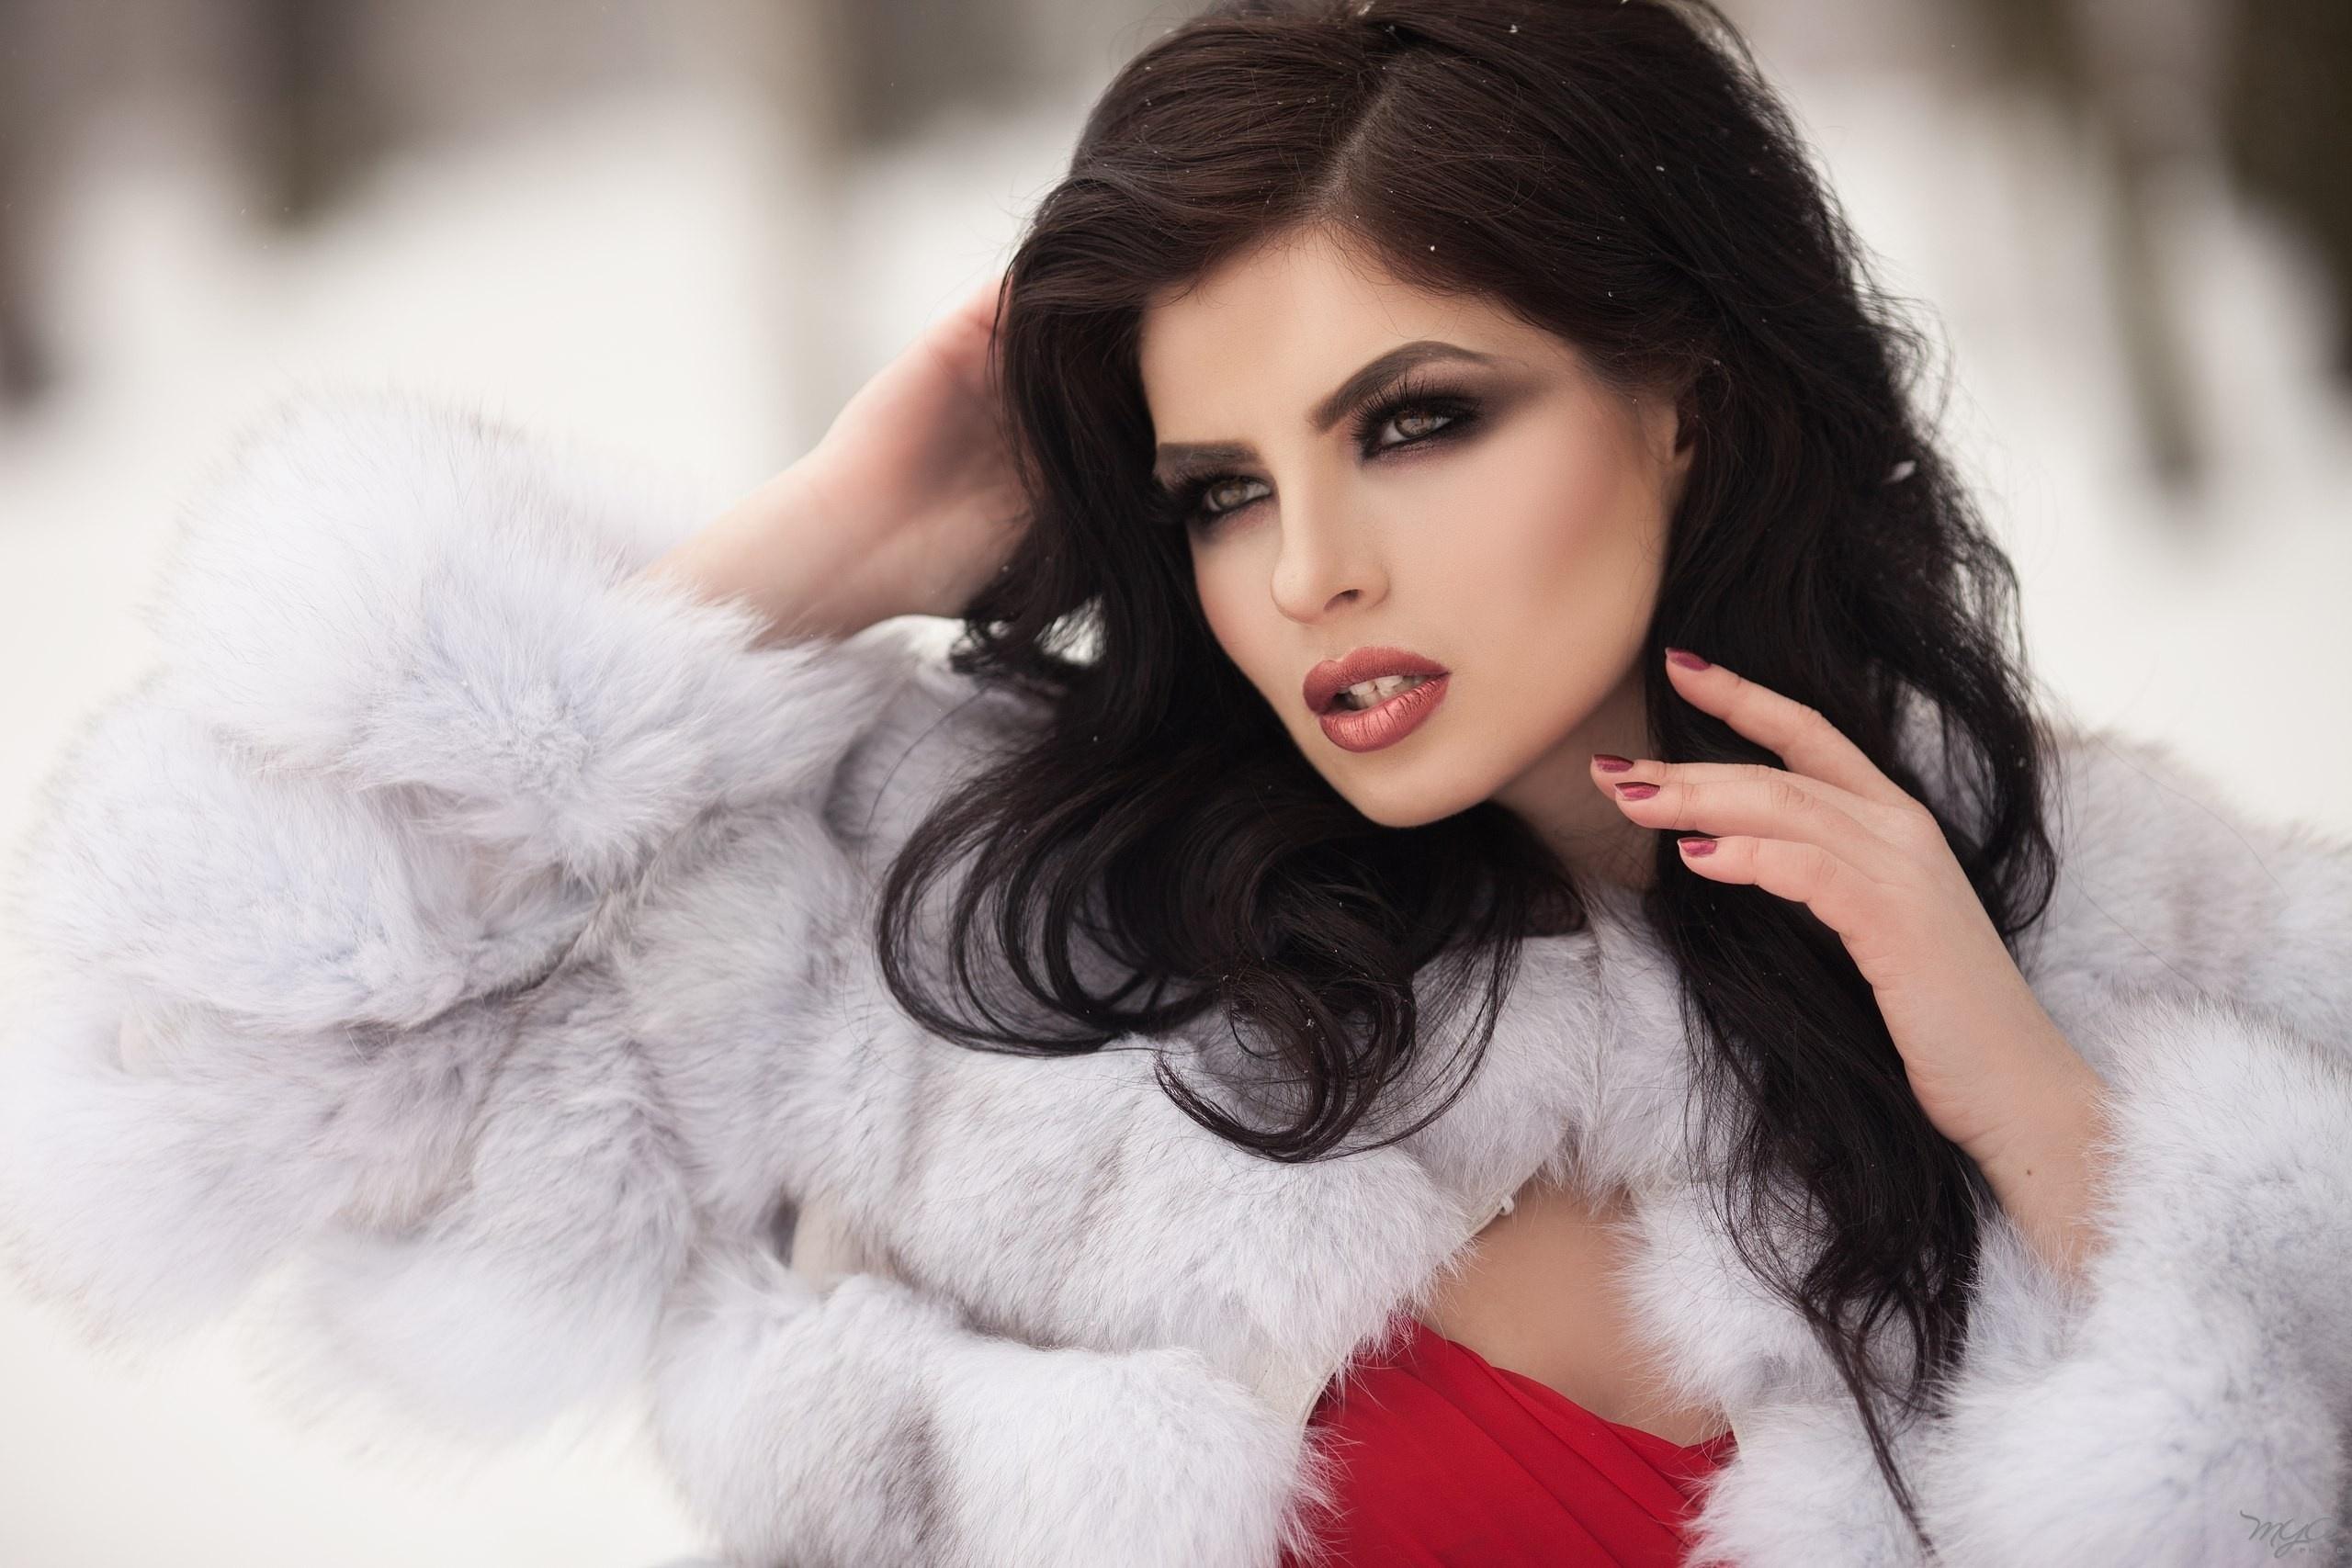 девушка брюнетка зима снег winter snow  № 2816670 загрузить